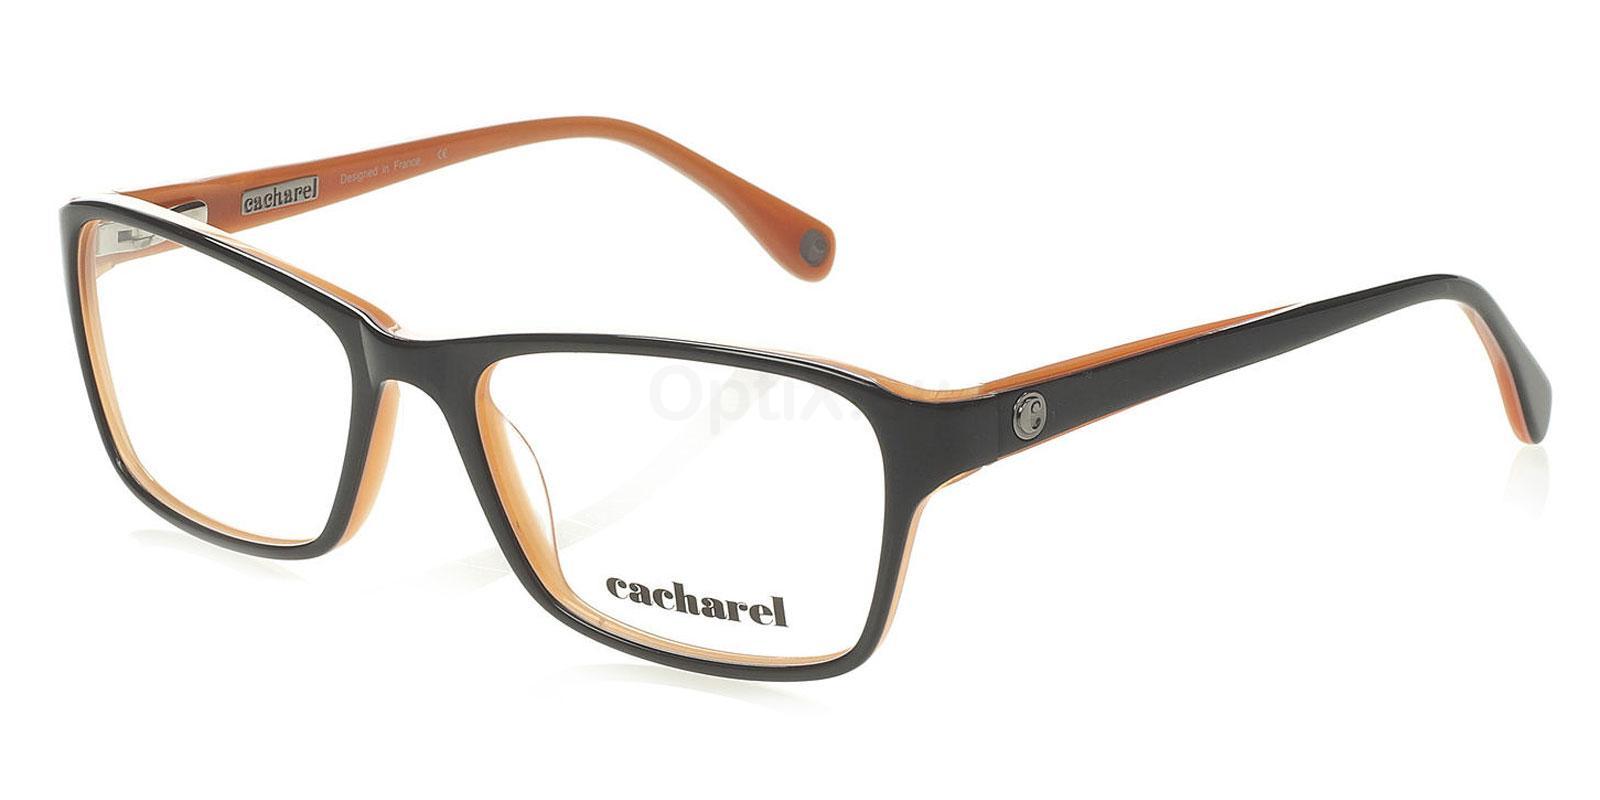 003 CA3018 , Cacharel